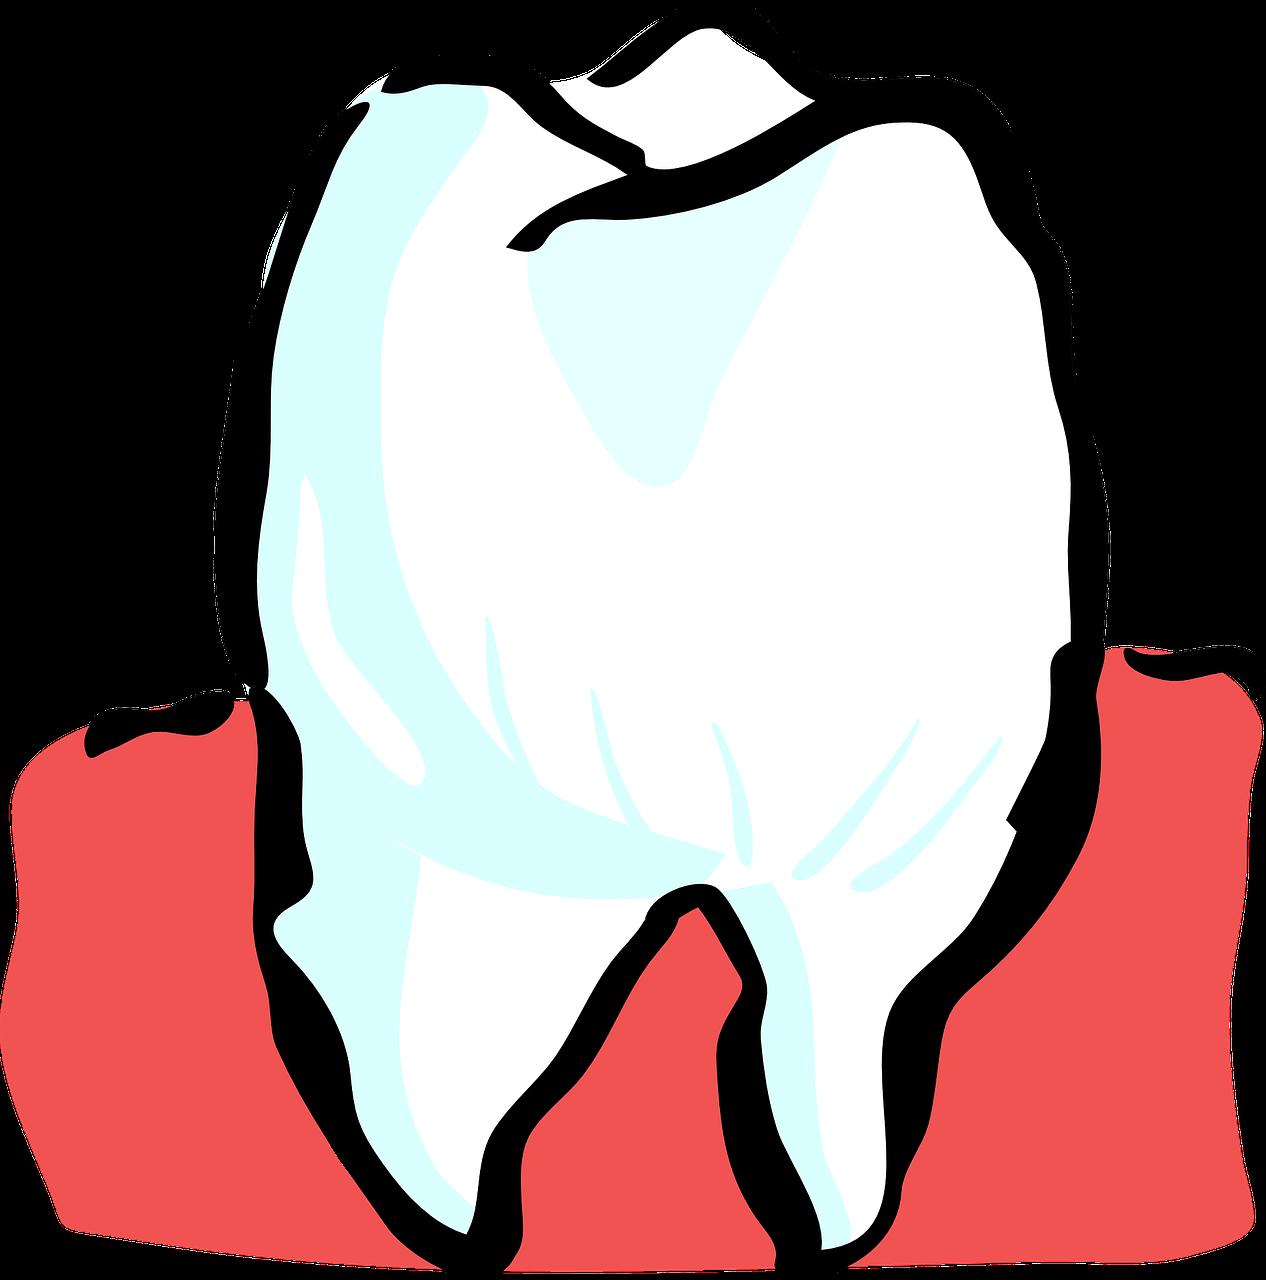 Keimpema K van tandarts spoed